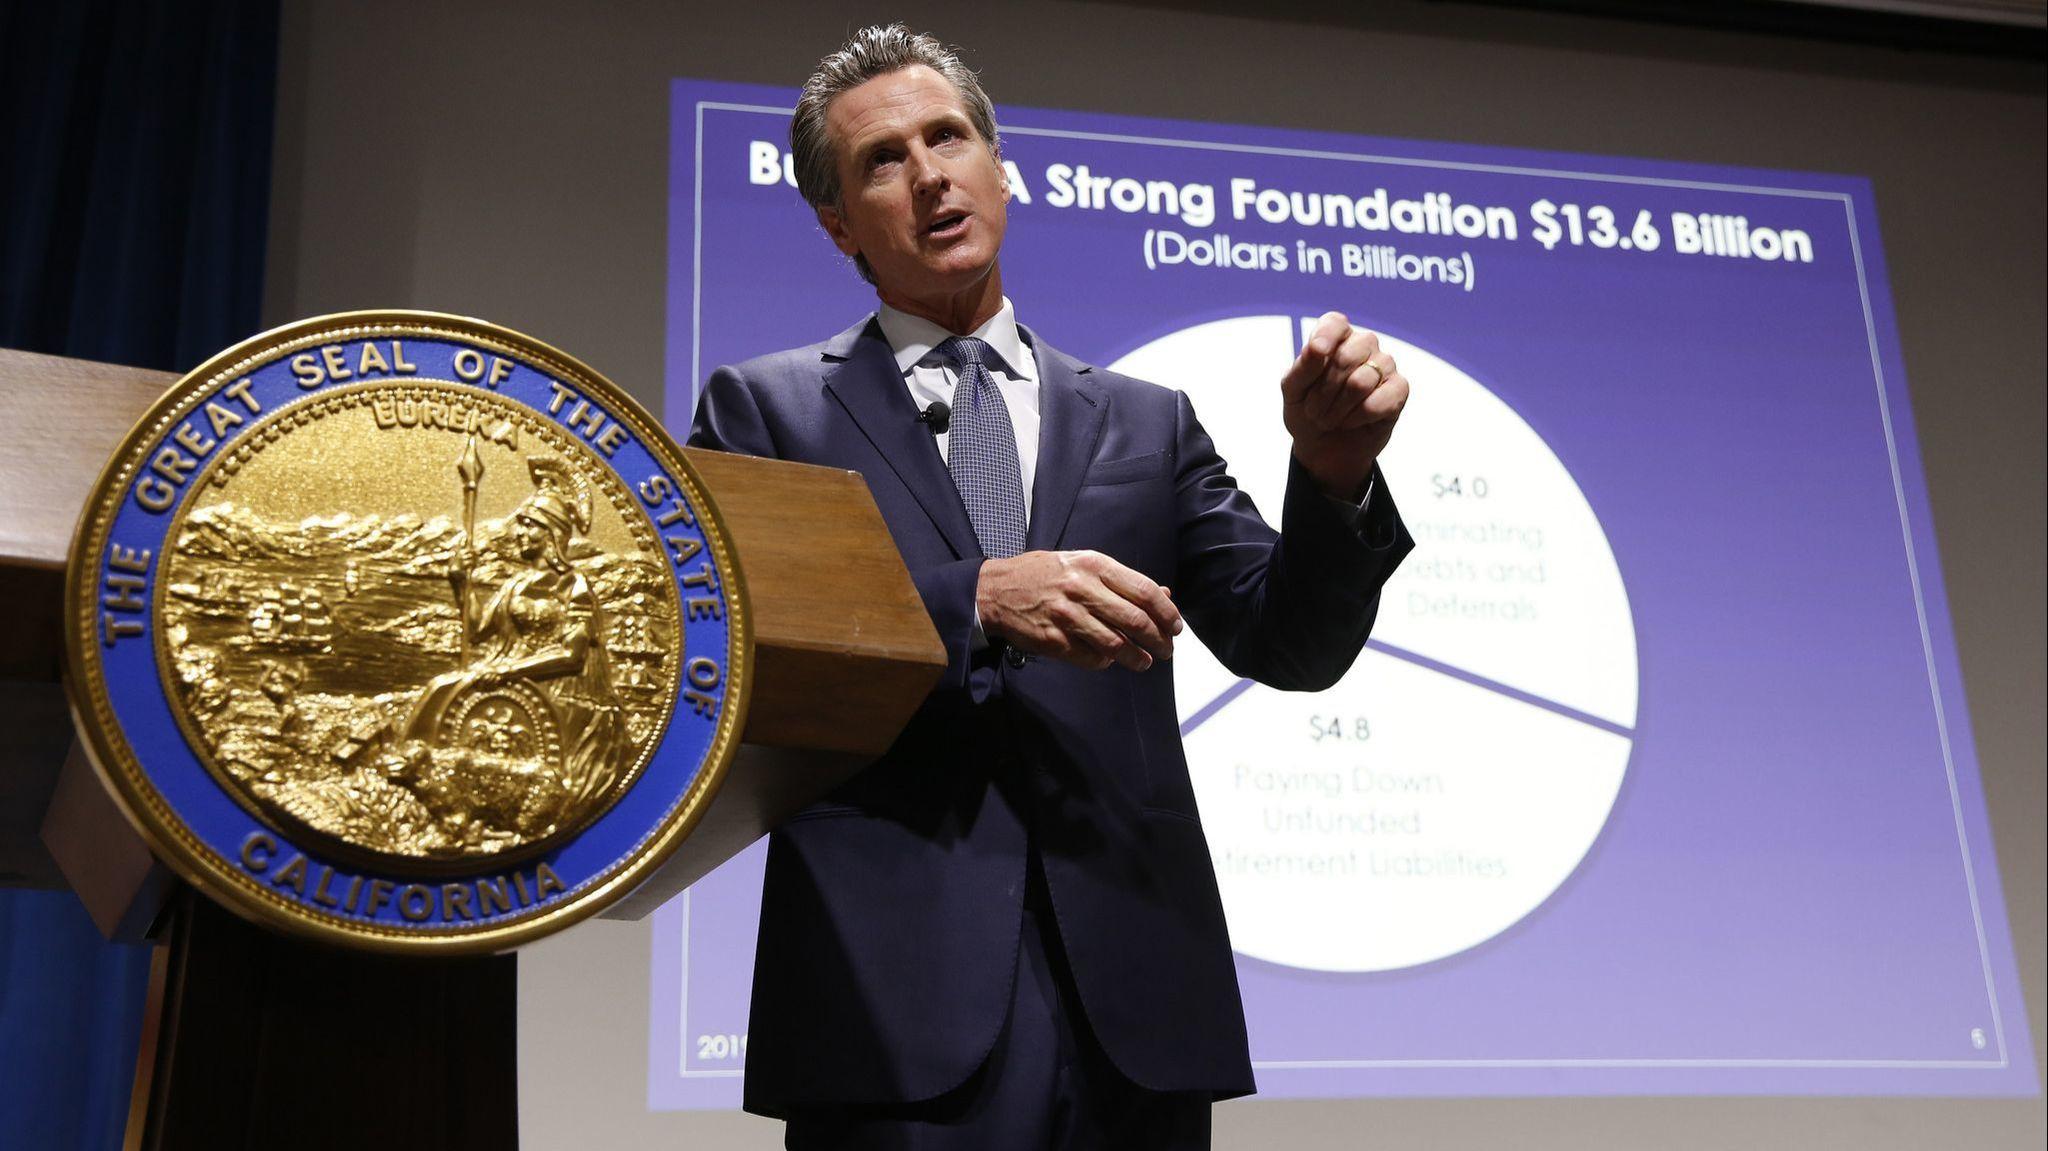 Gavin Newsom just pried open California's checkbook